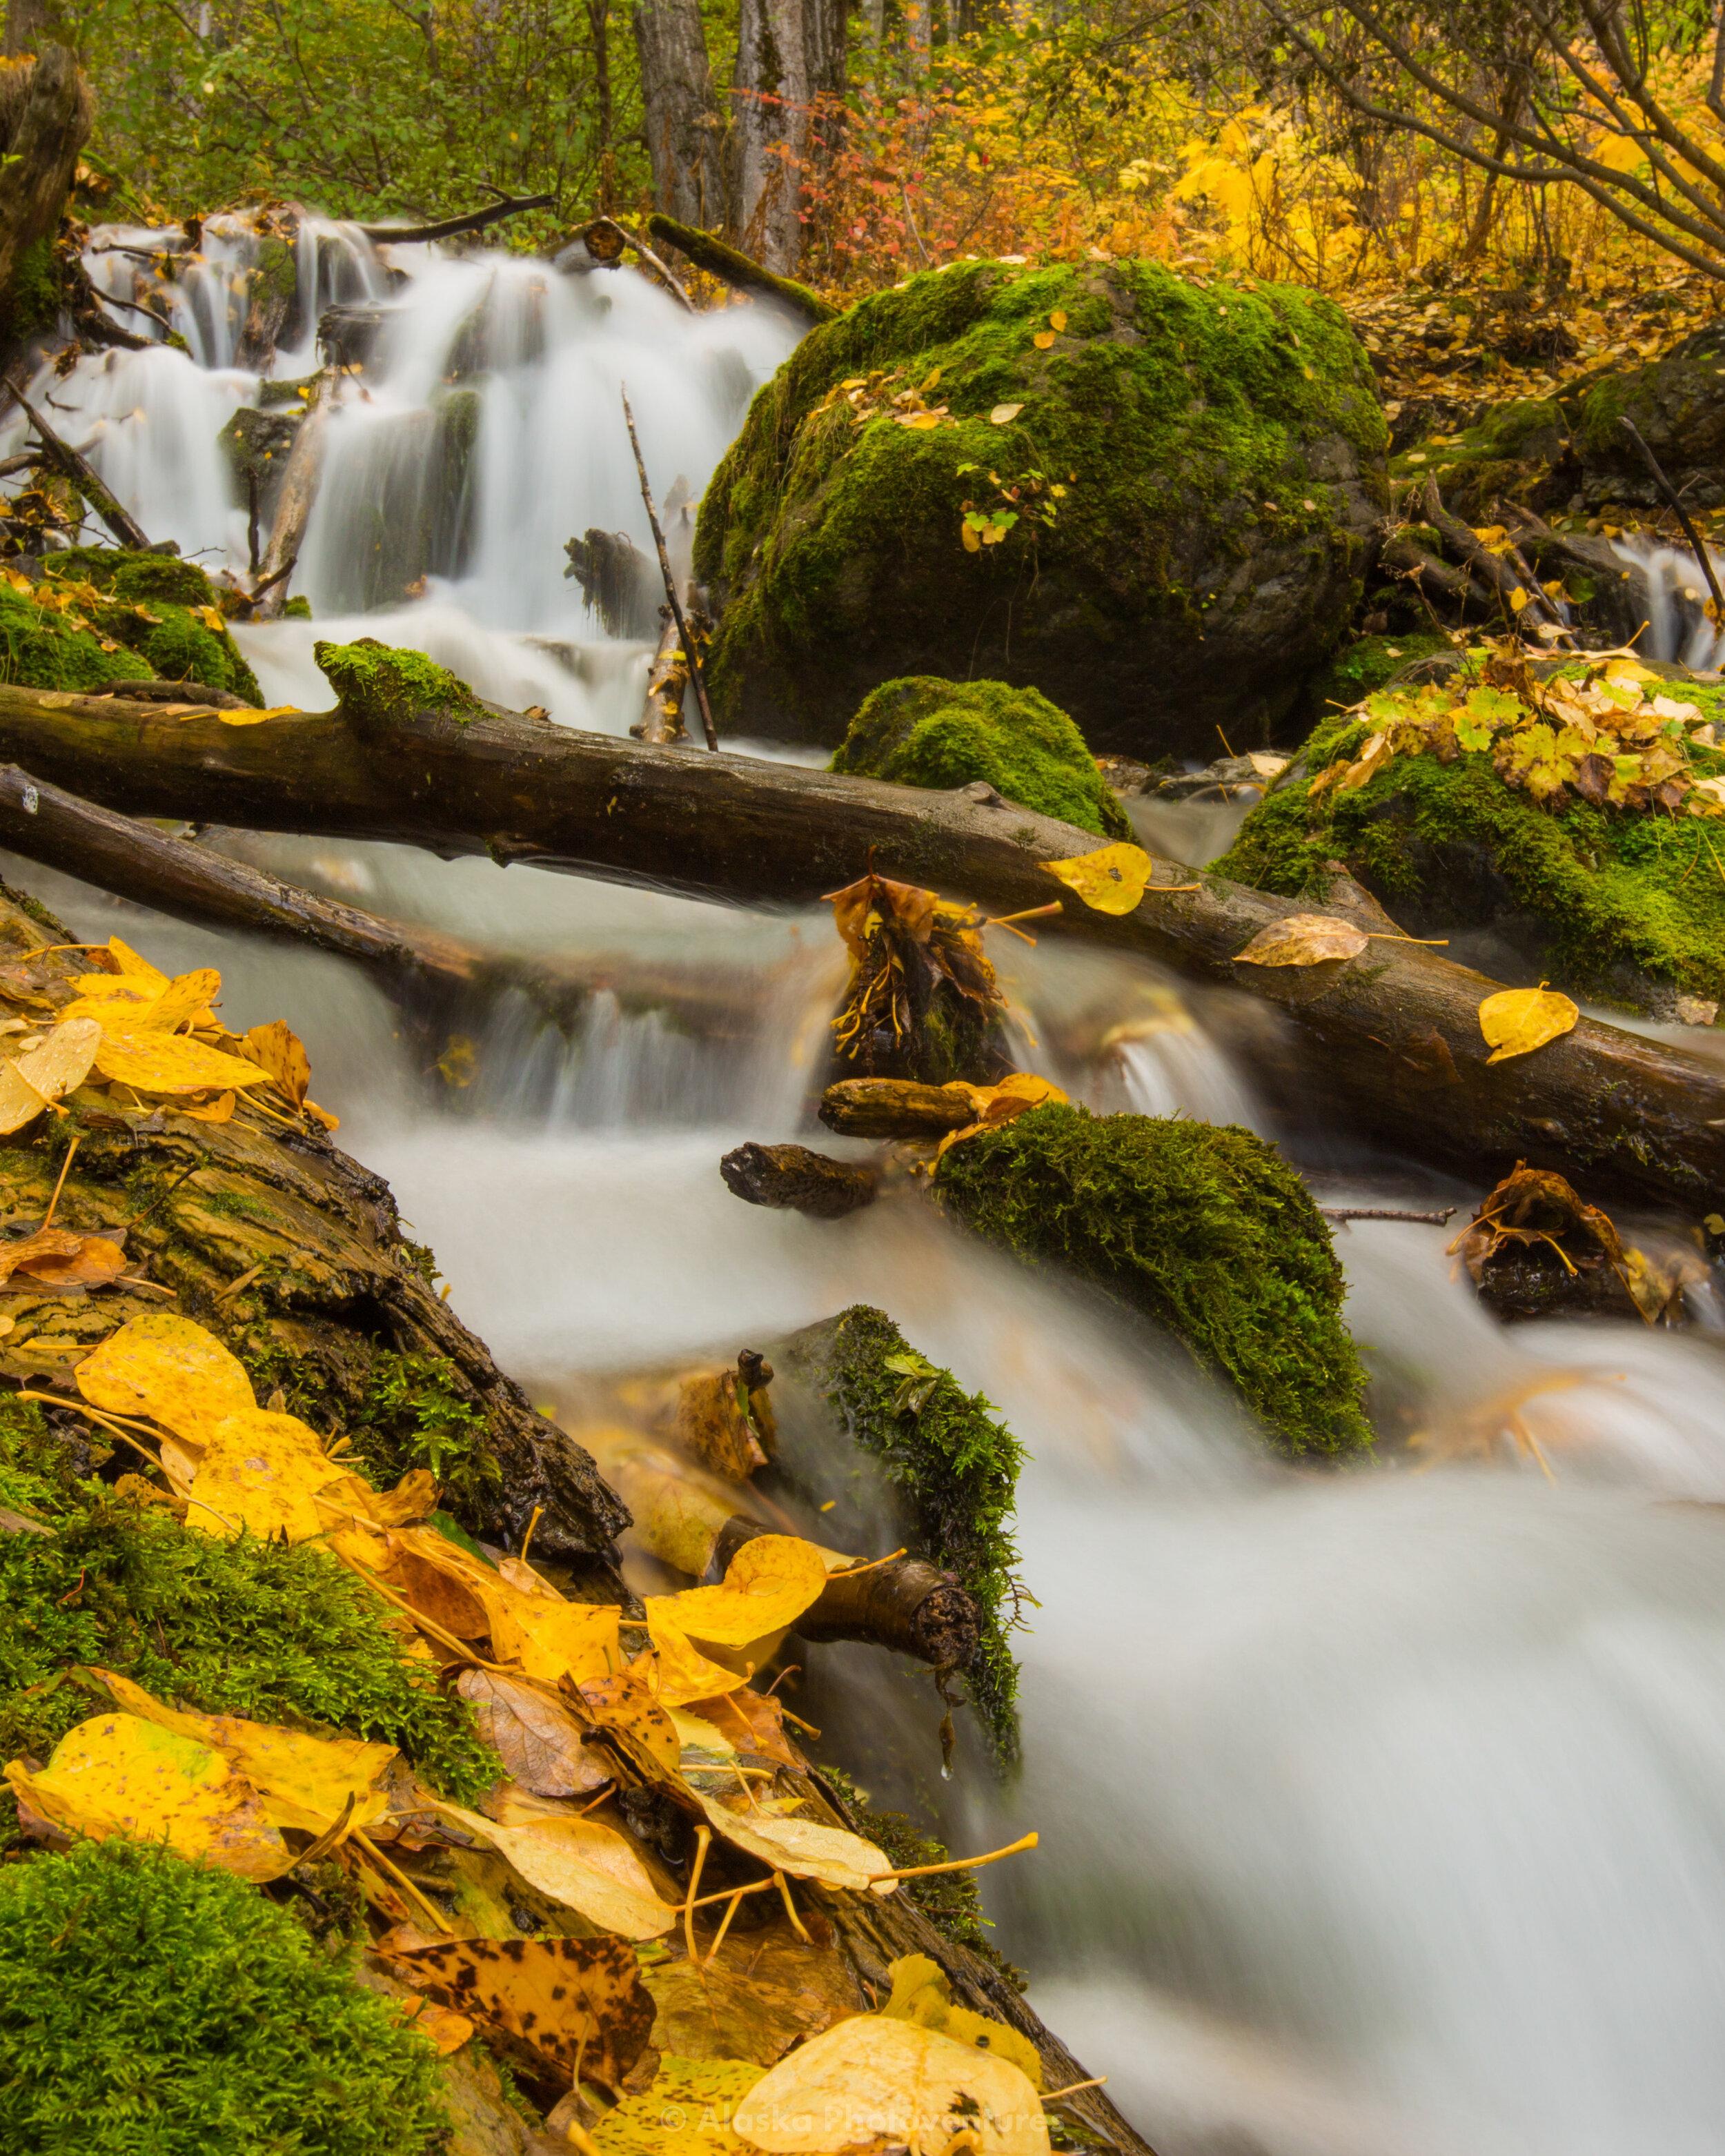 alaska-waterfall-long-exposure-dan-redfield.jpg